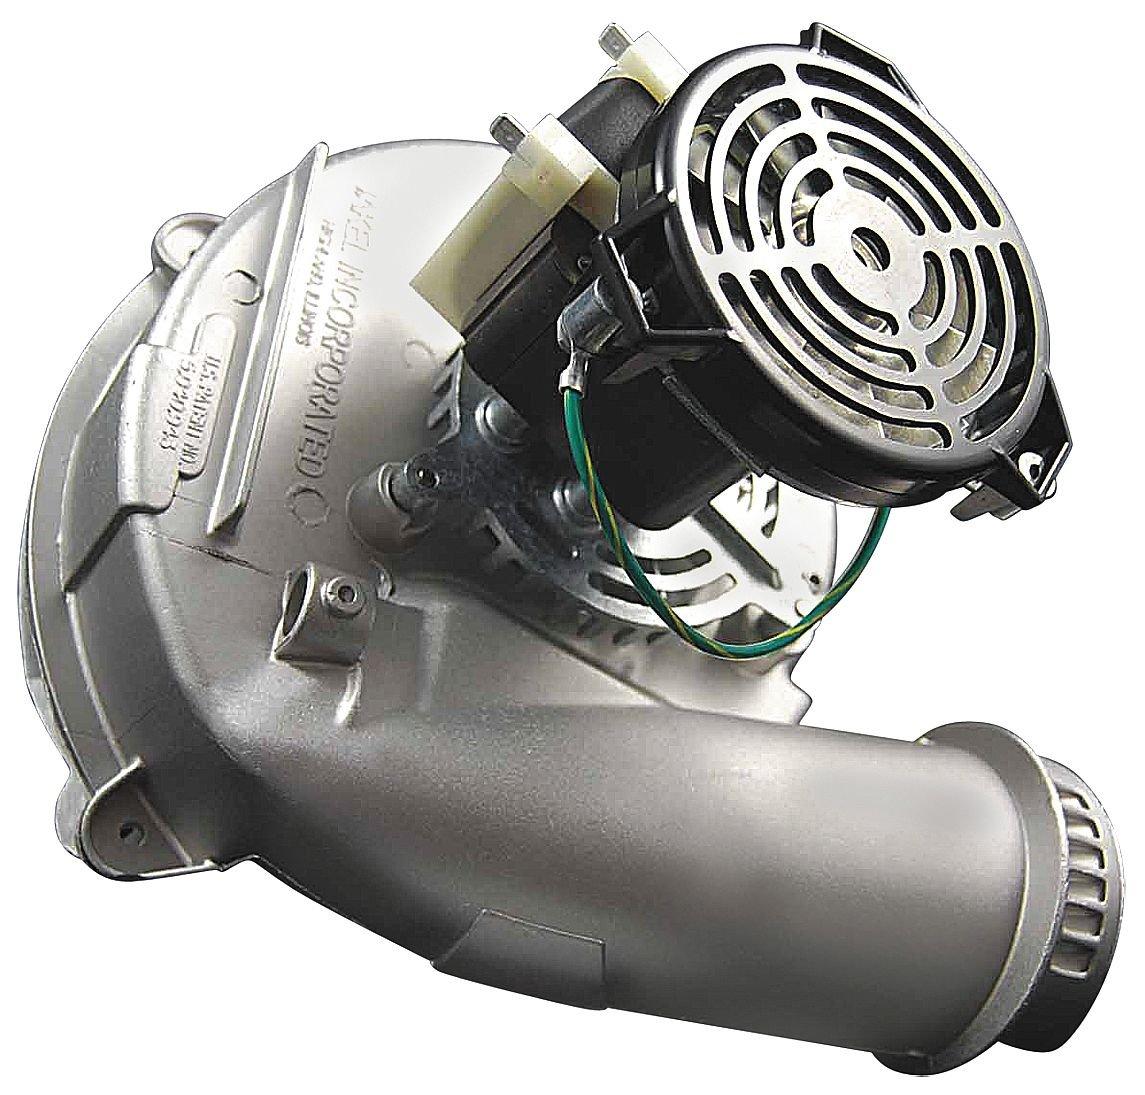 Packard [Alternative dealer] Safety and trust 66847 Rheem Direct Replacement Draft Watts 28 Inducer